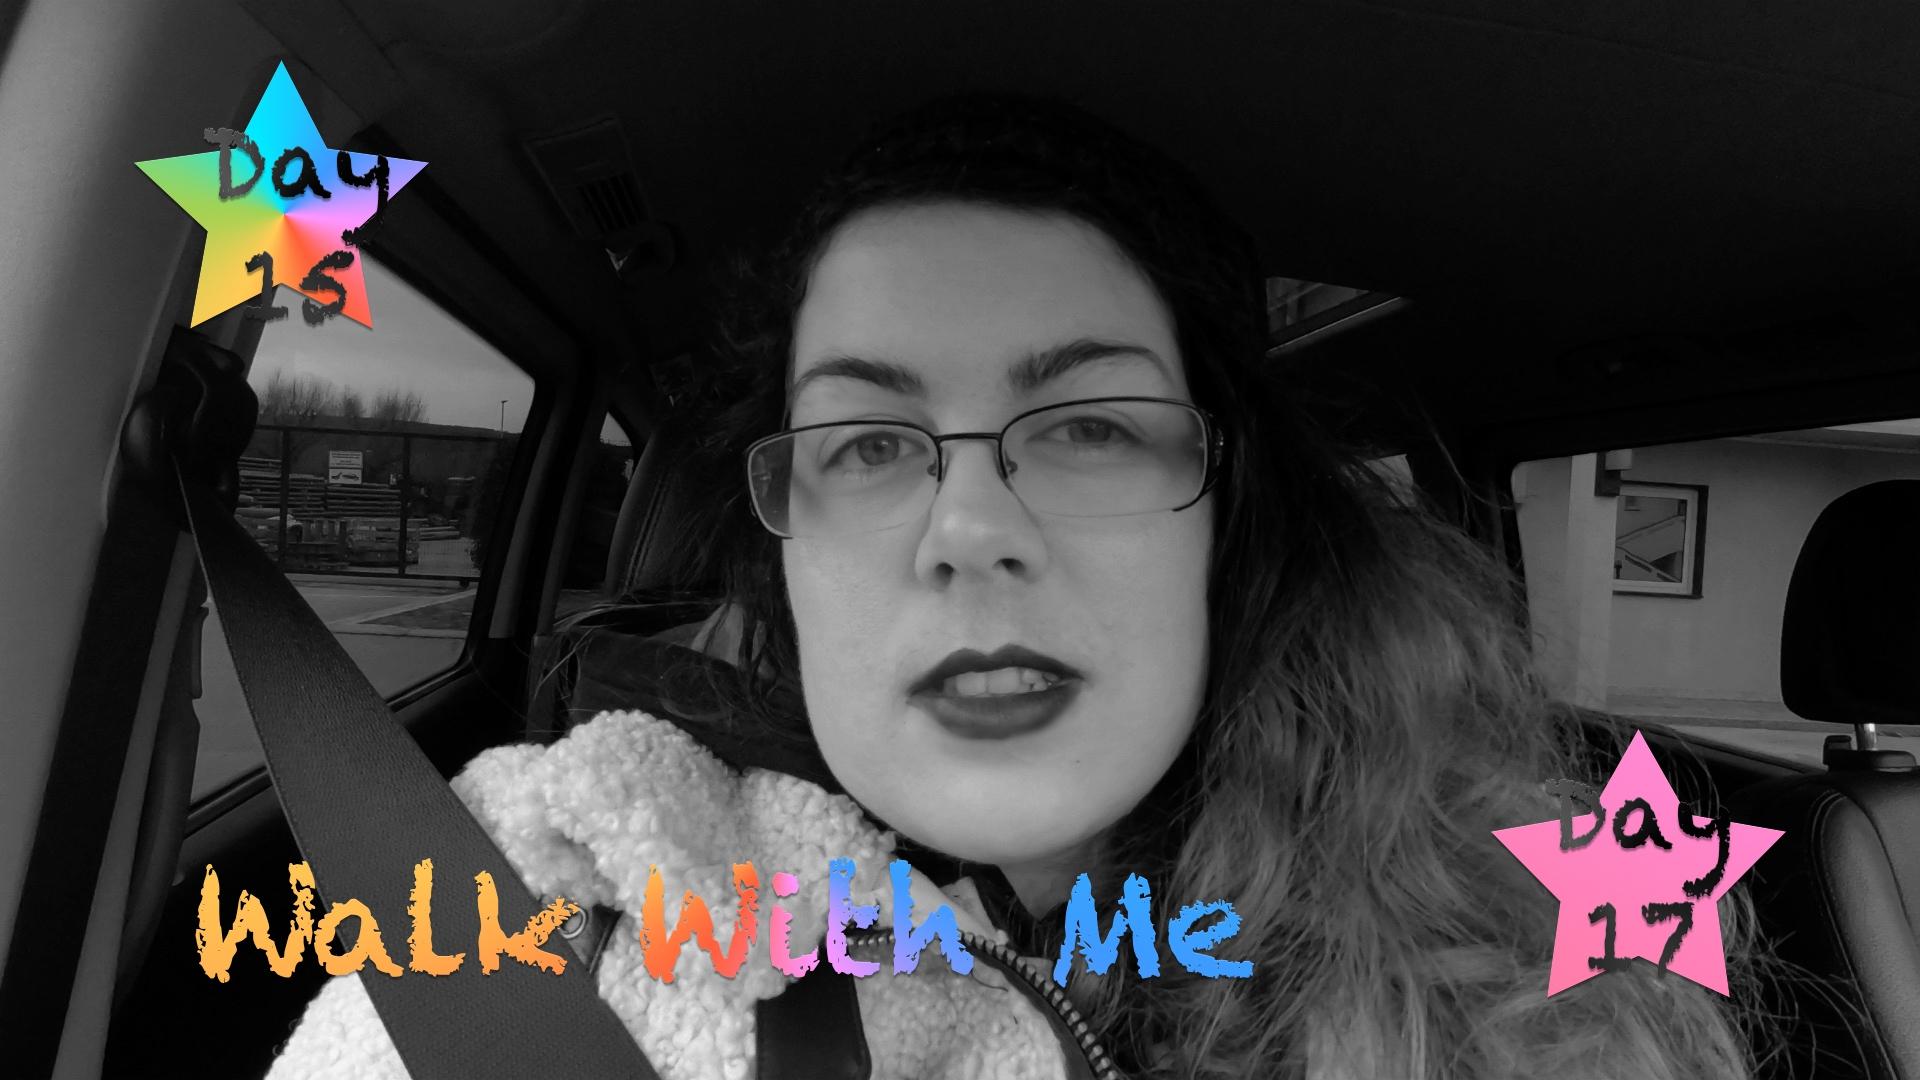 Blogmas week 2